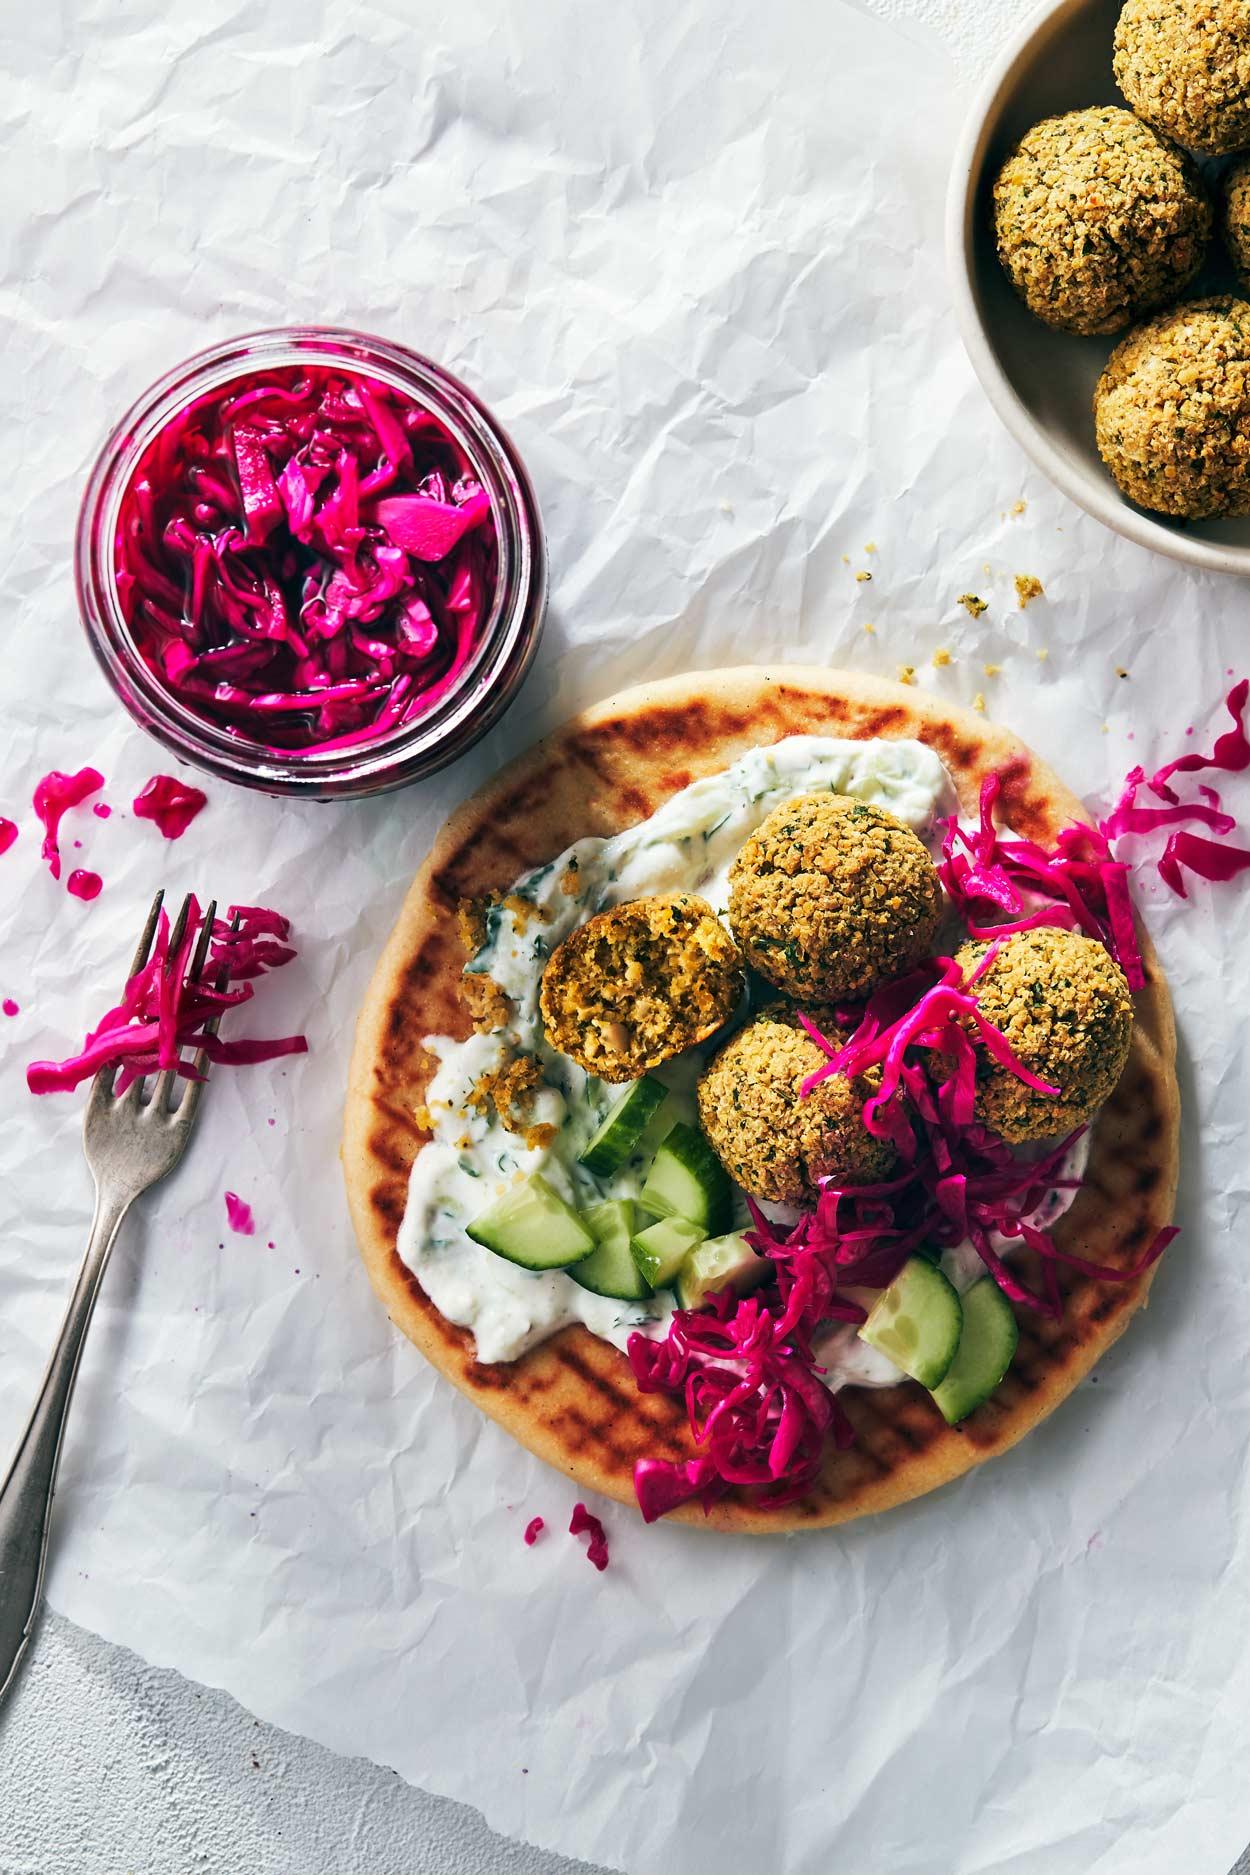 Oven Baked Falafel   Evergreen Kitchen   Vegan & Gluten Free